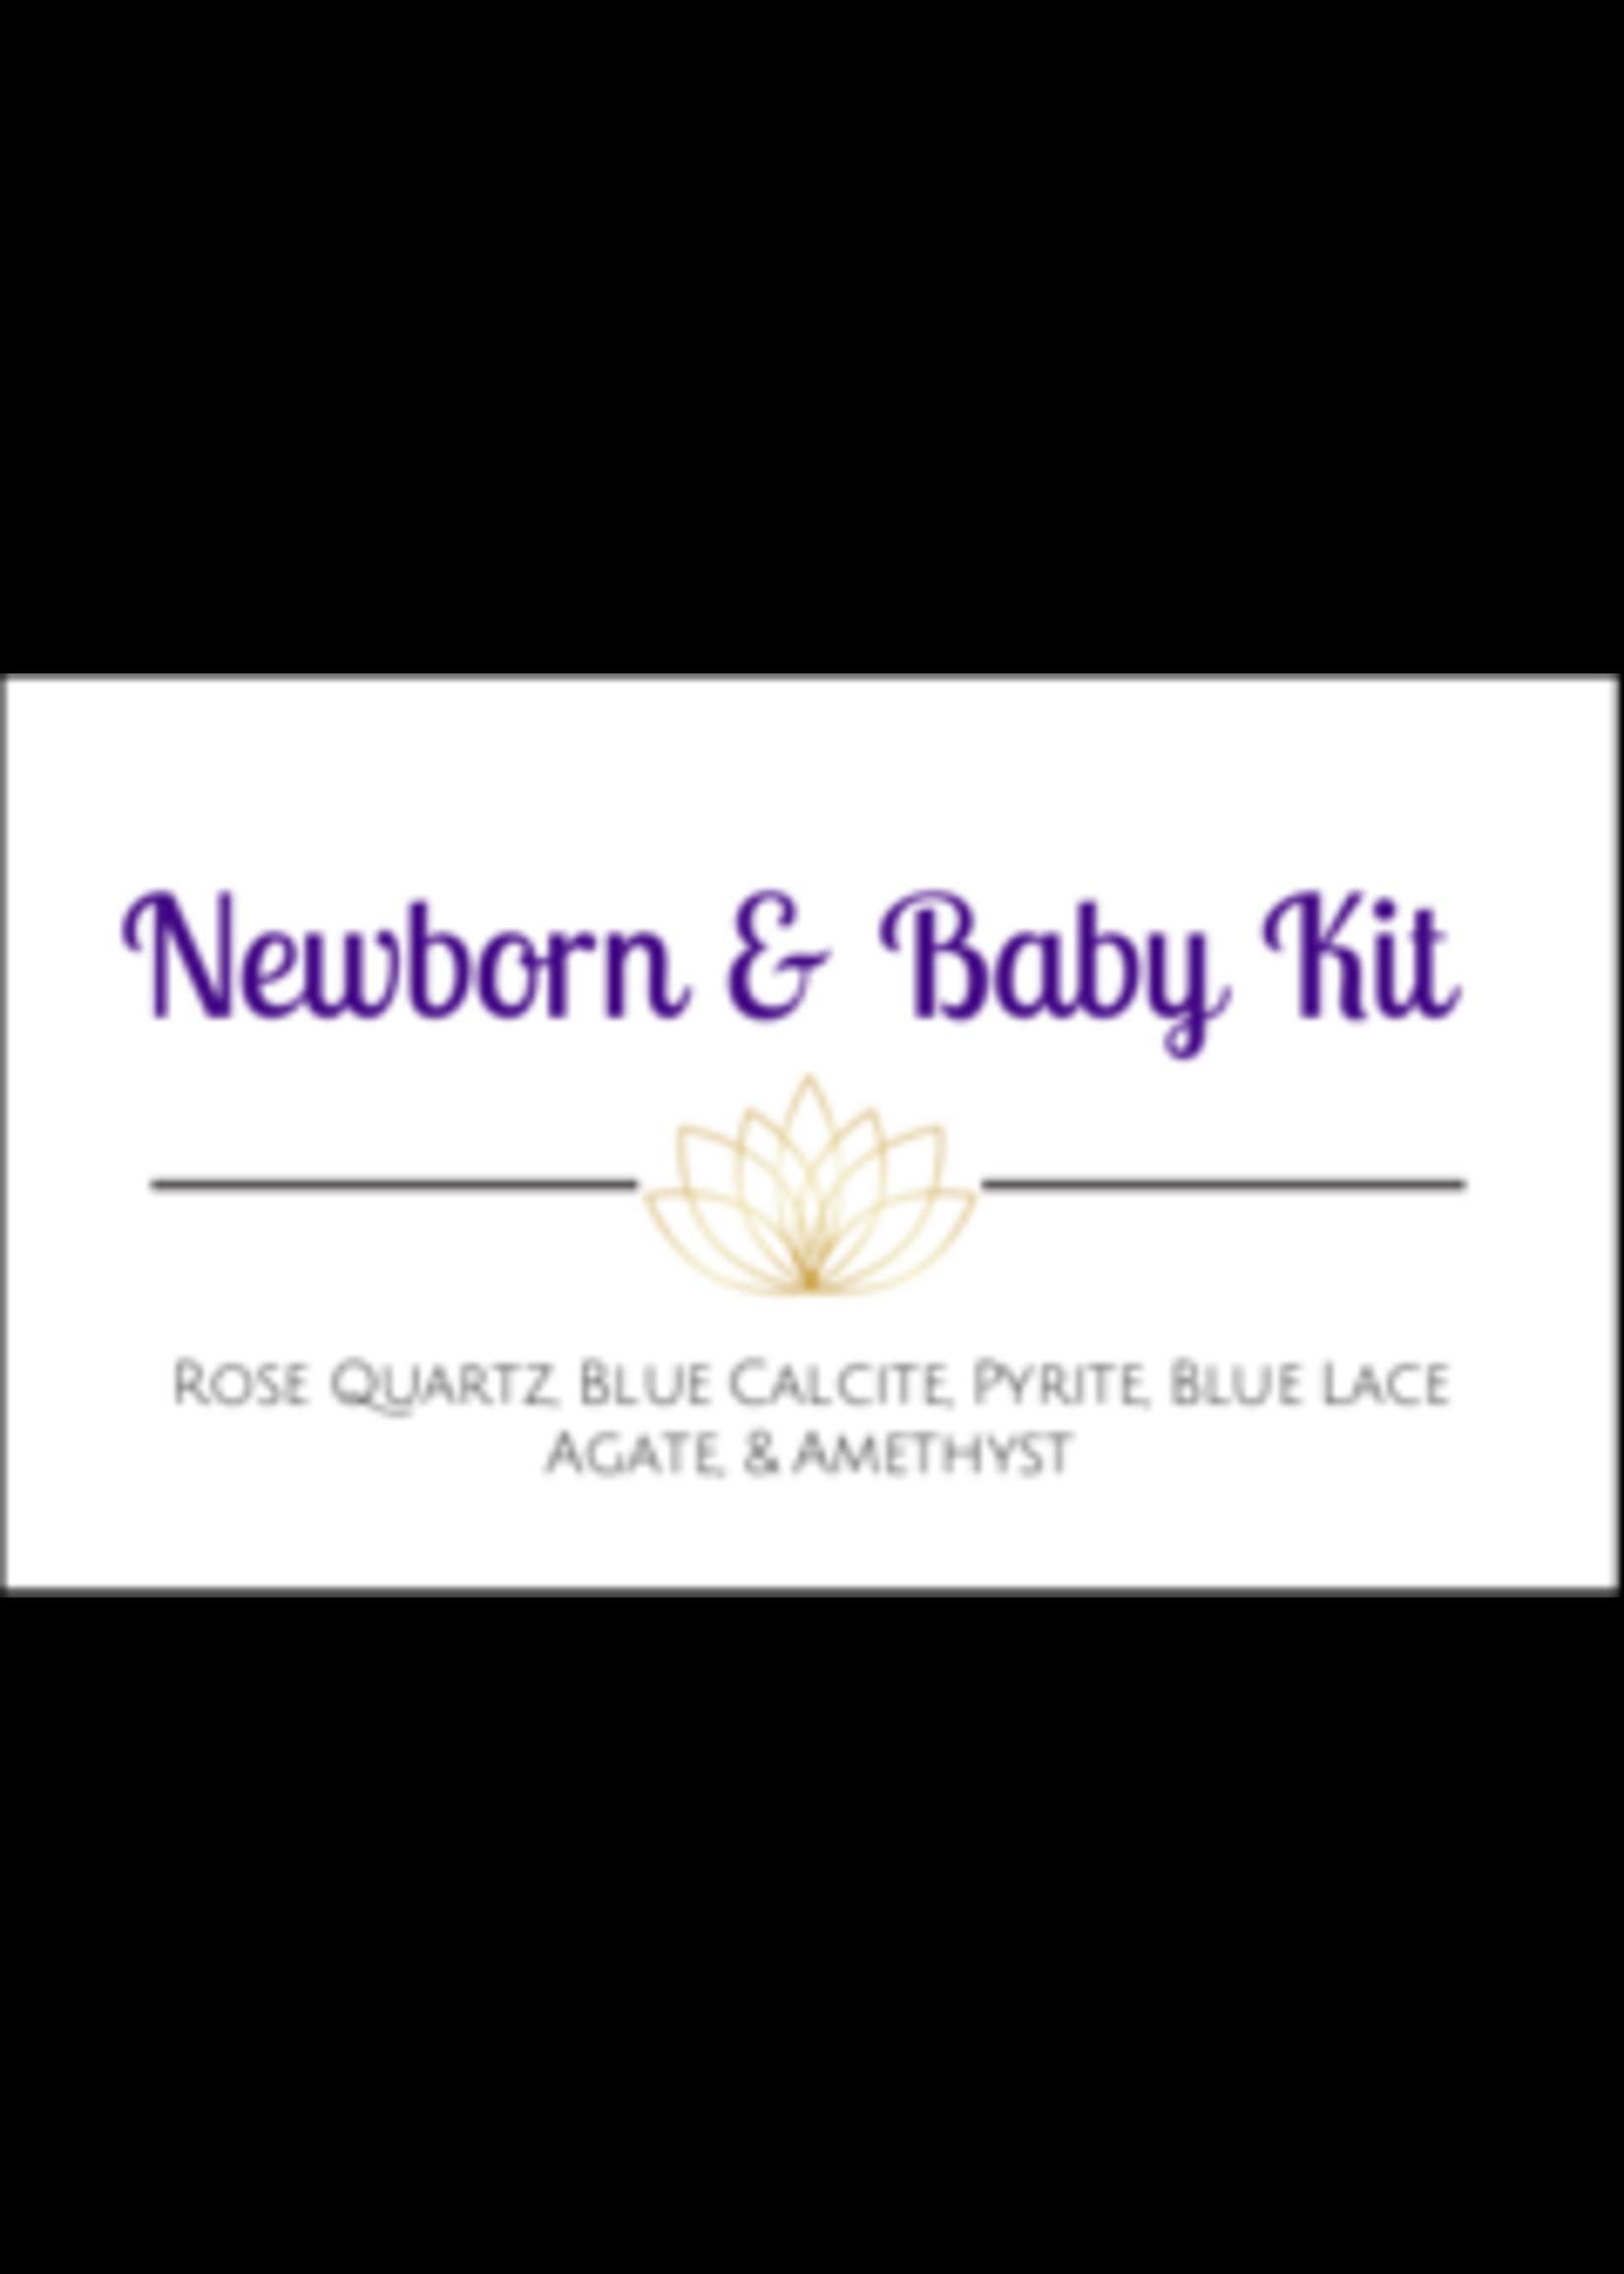 Newborn & Baby Crystal Kit Cards - Box of 100